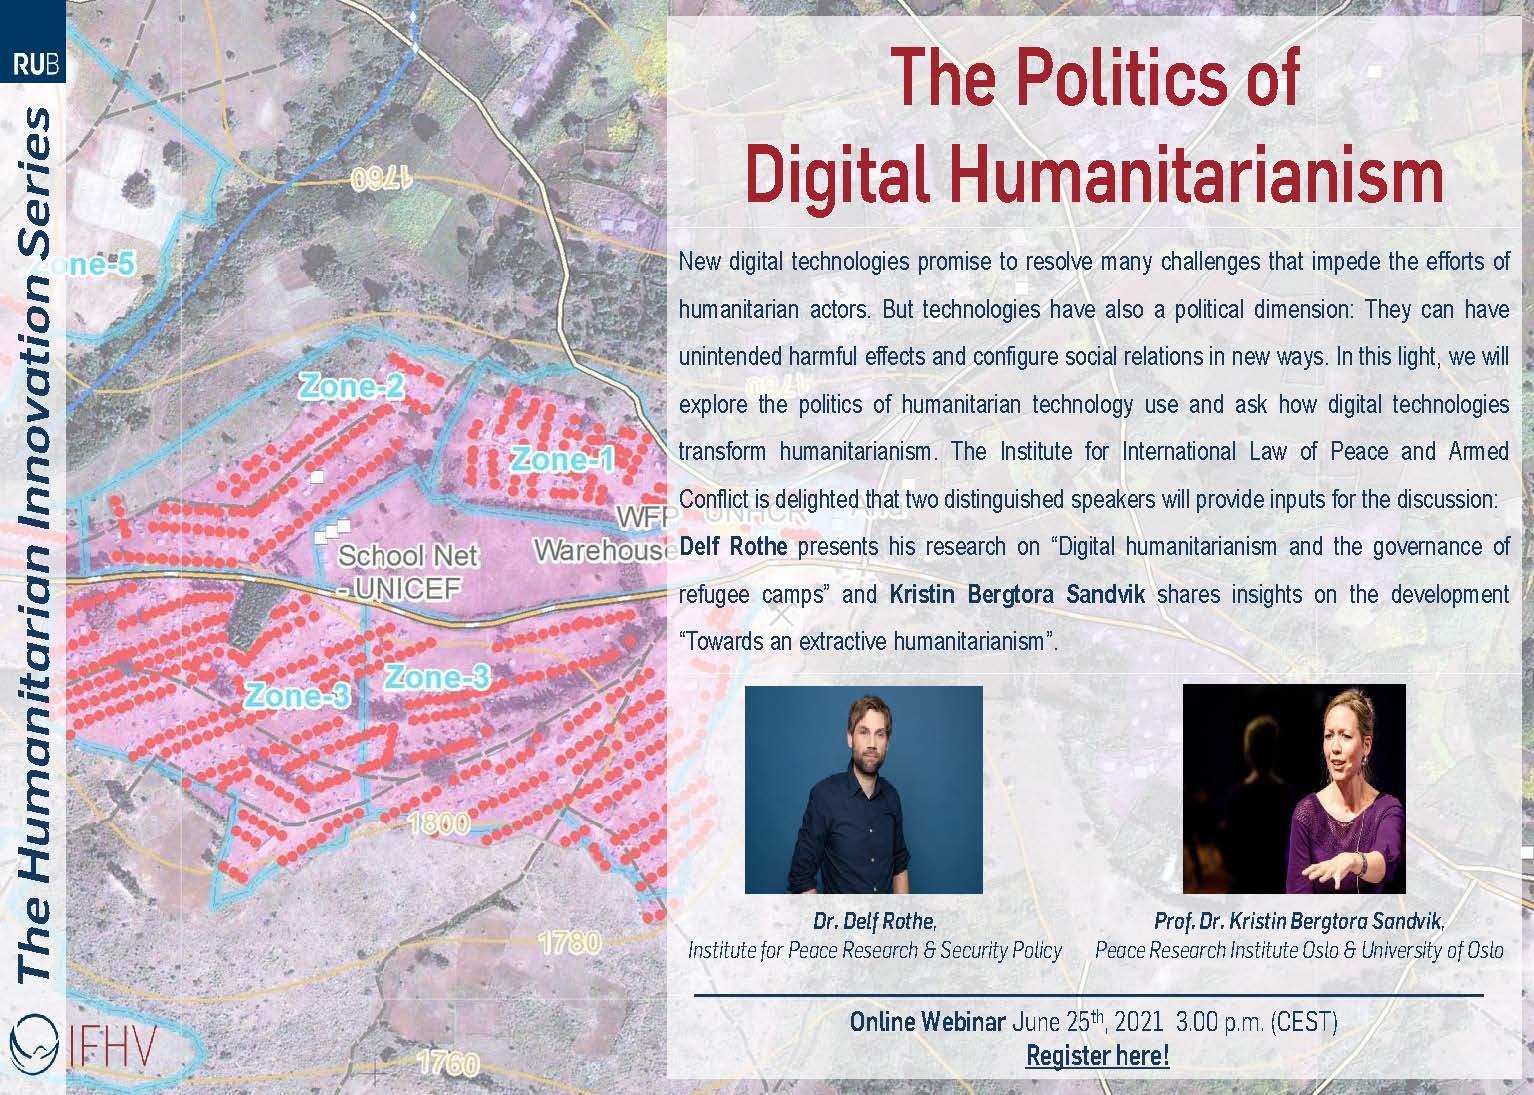 The Politics of Digital Humanitarianism_1